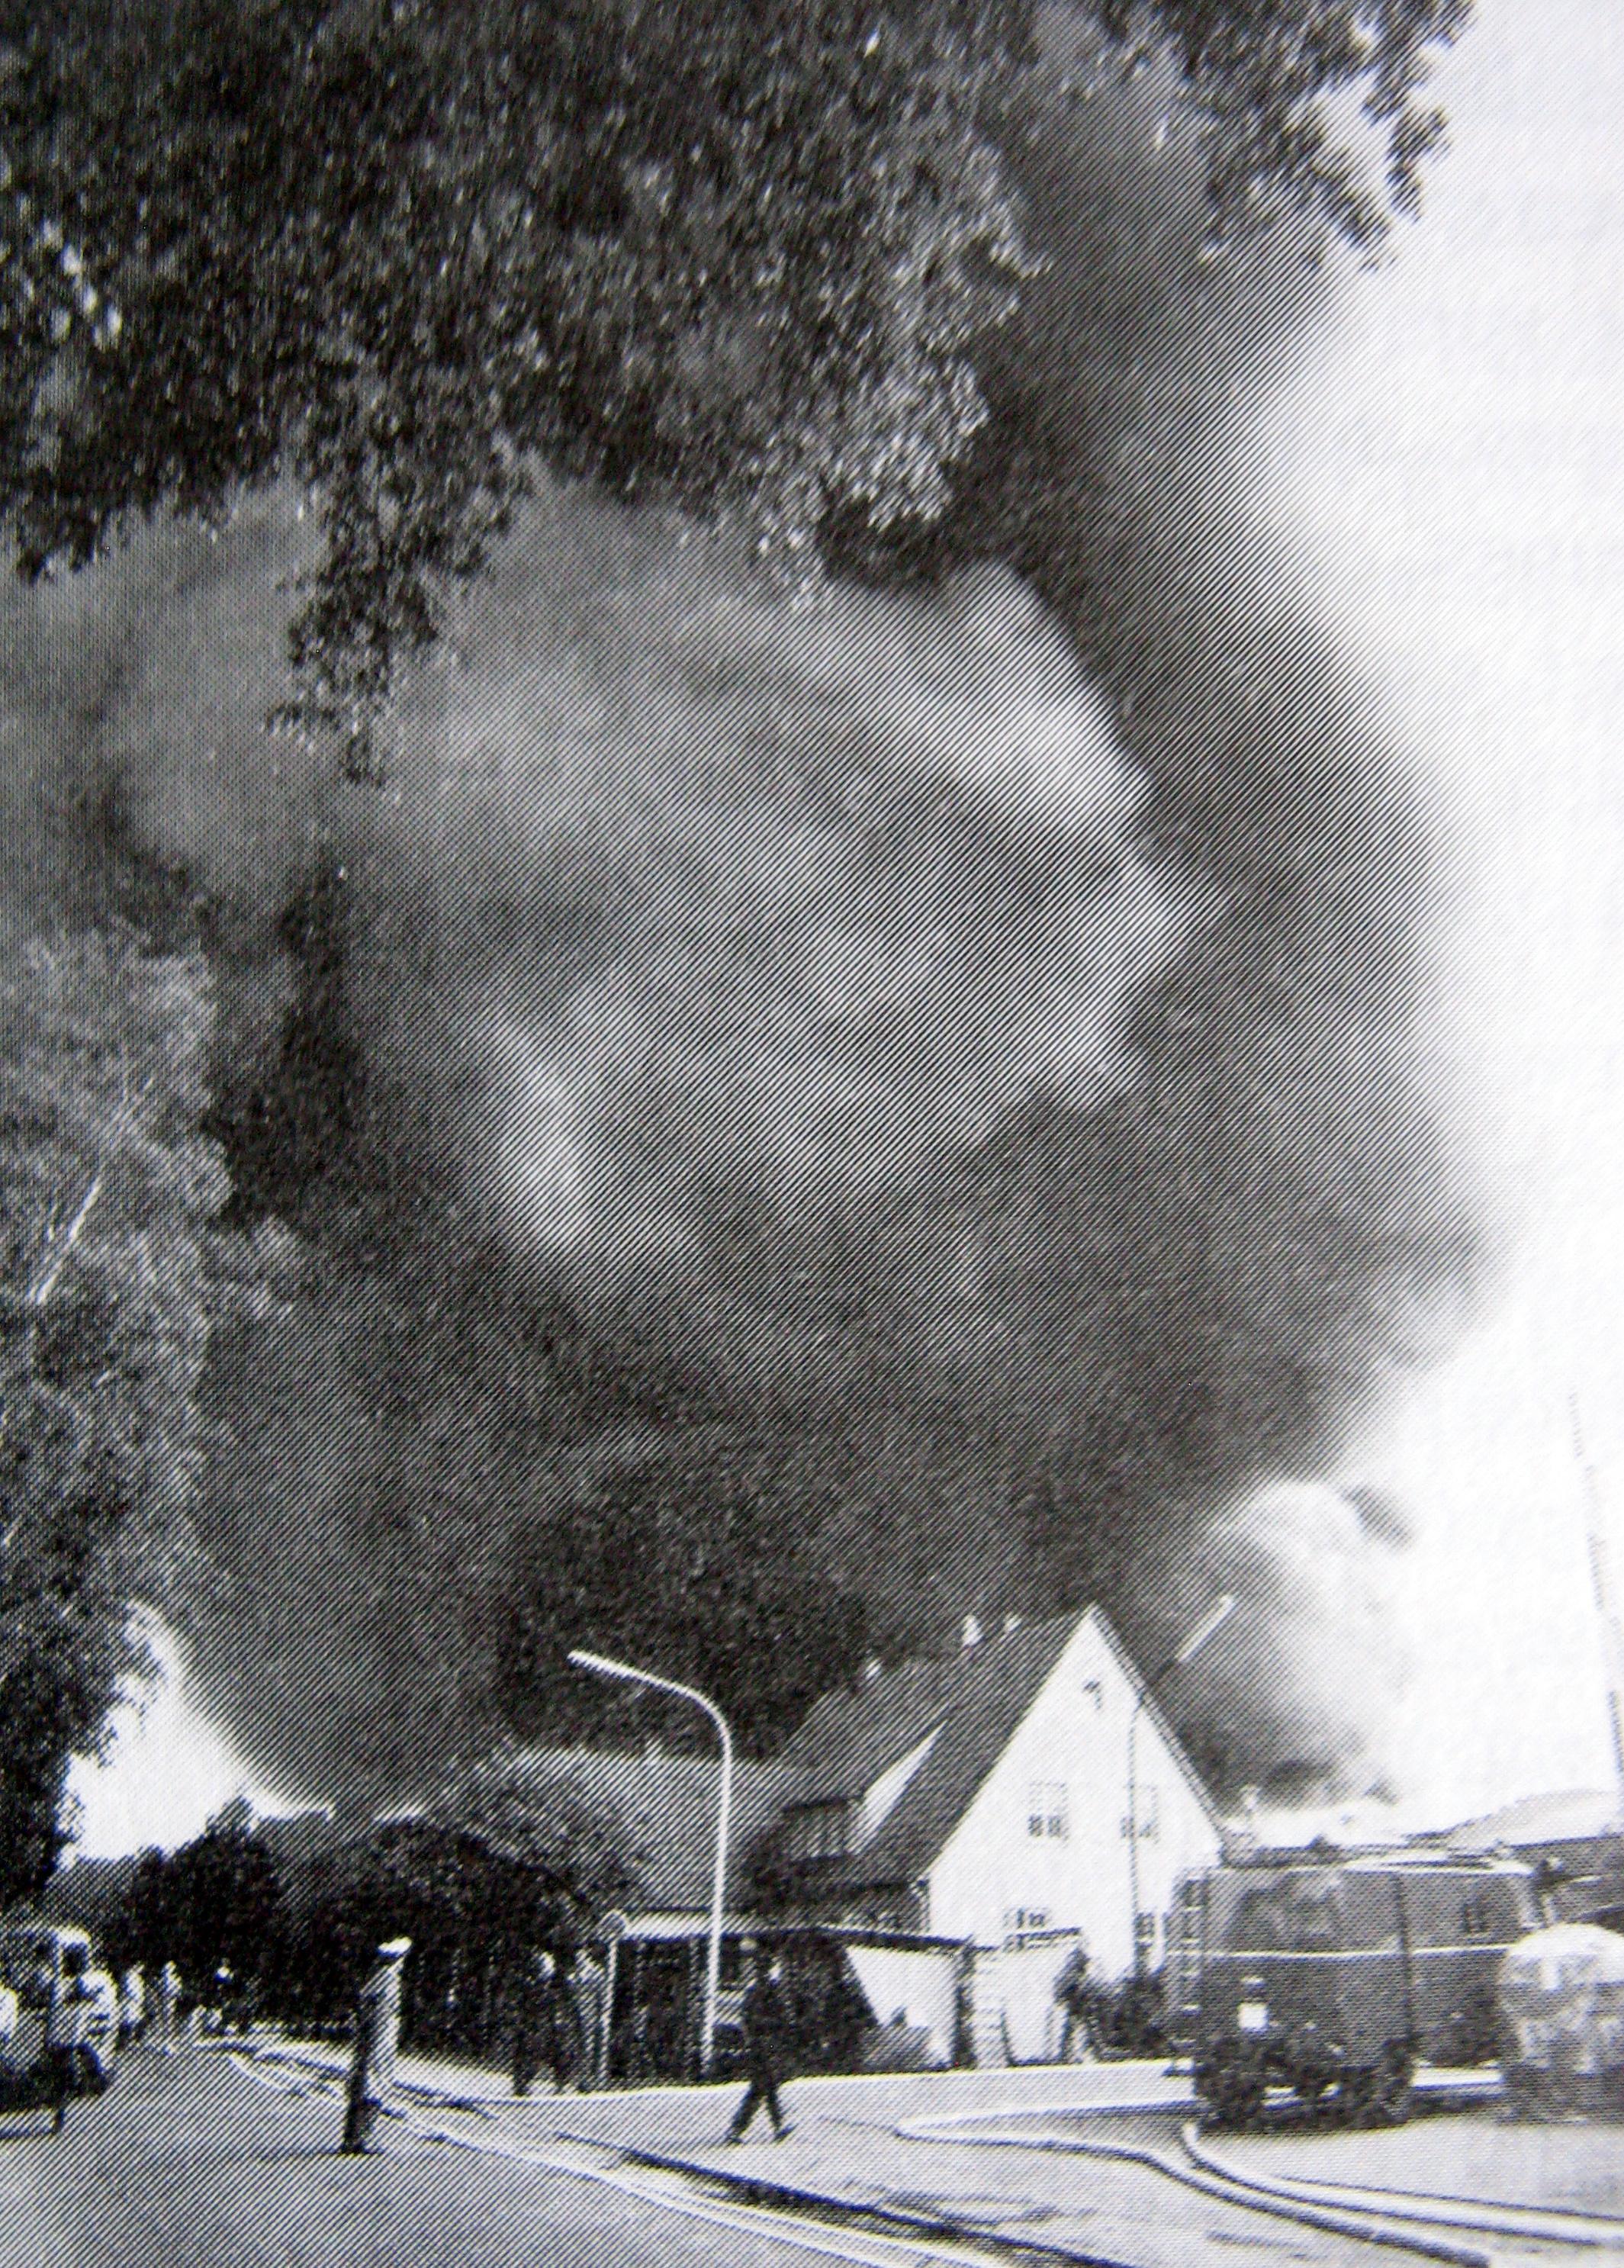 Großbrand-BK-RahestrOktober-15-05-1972